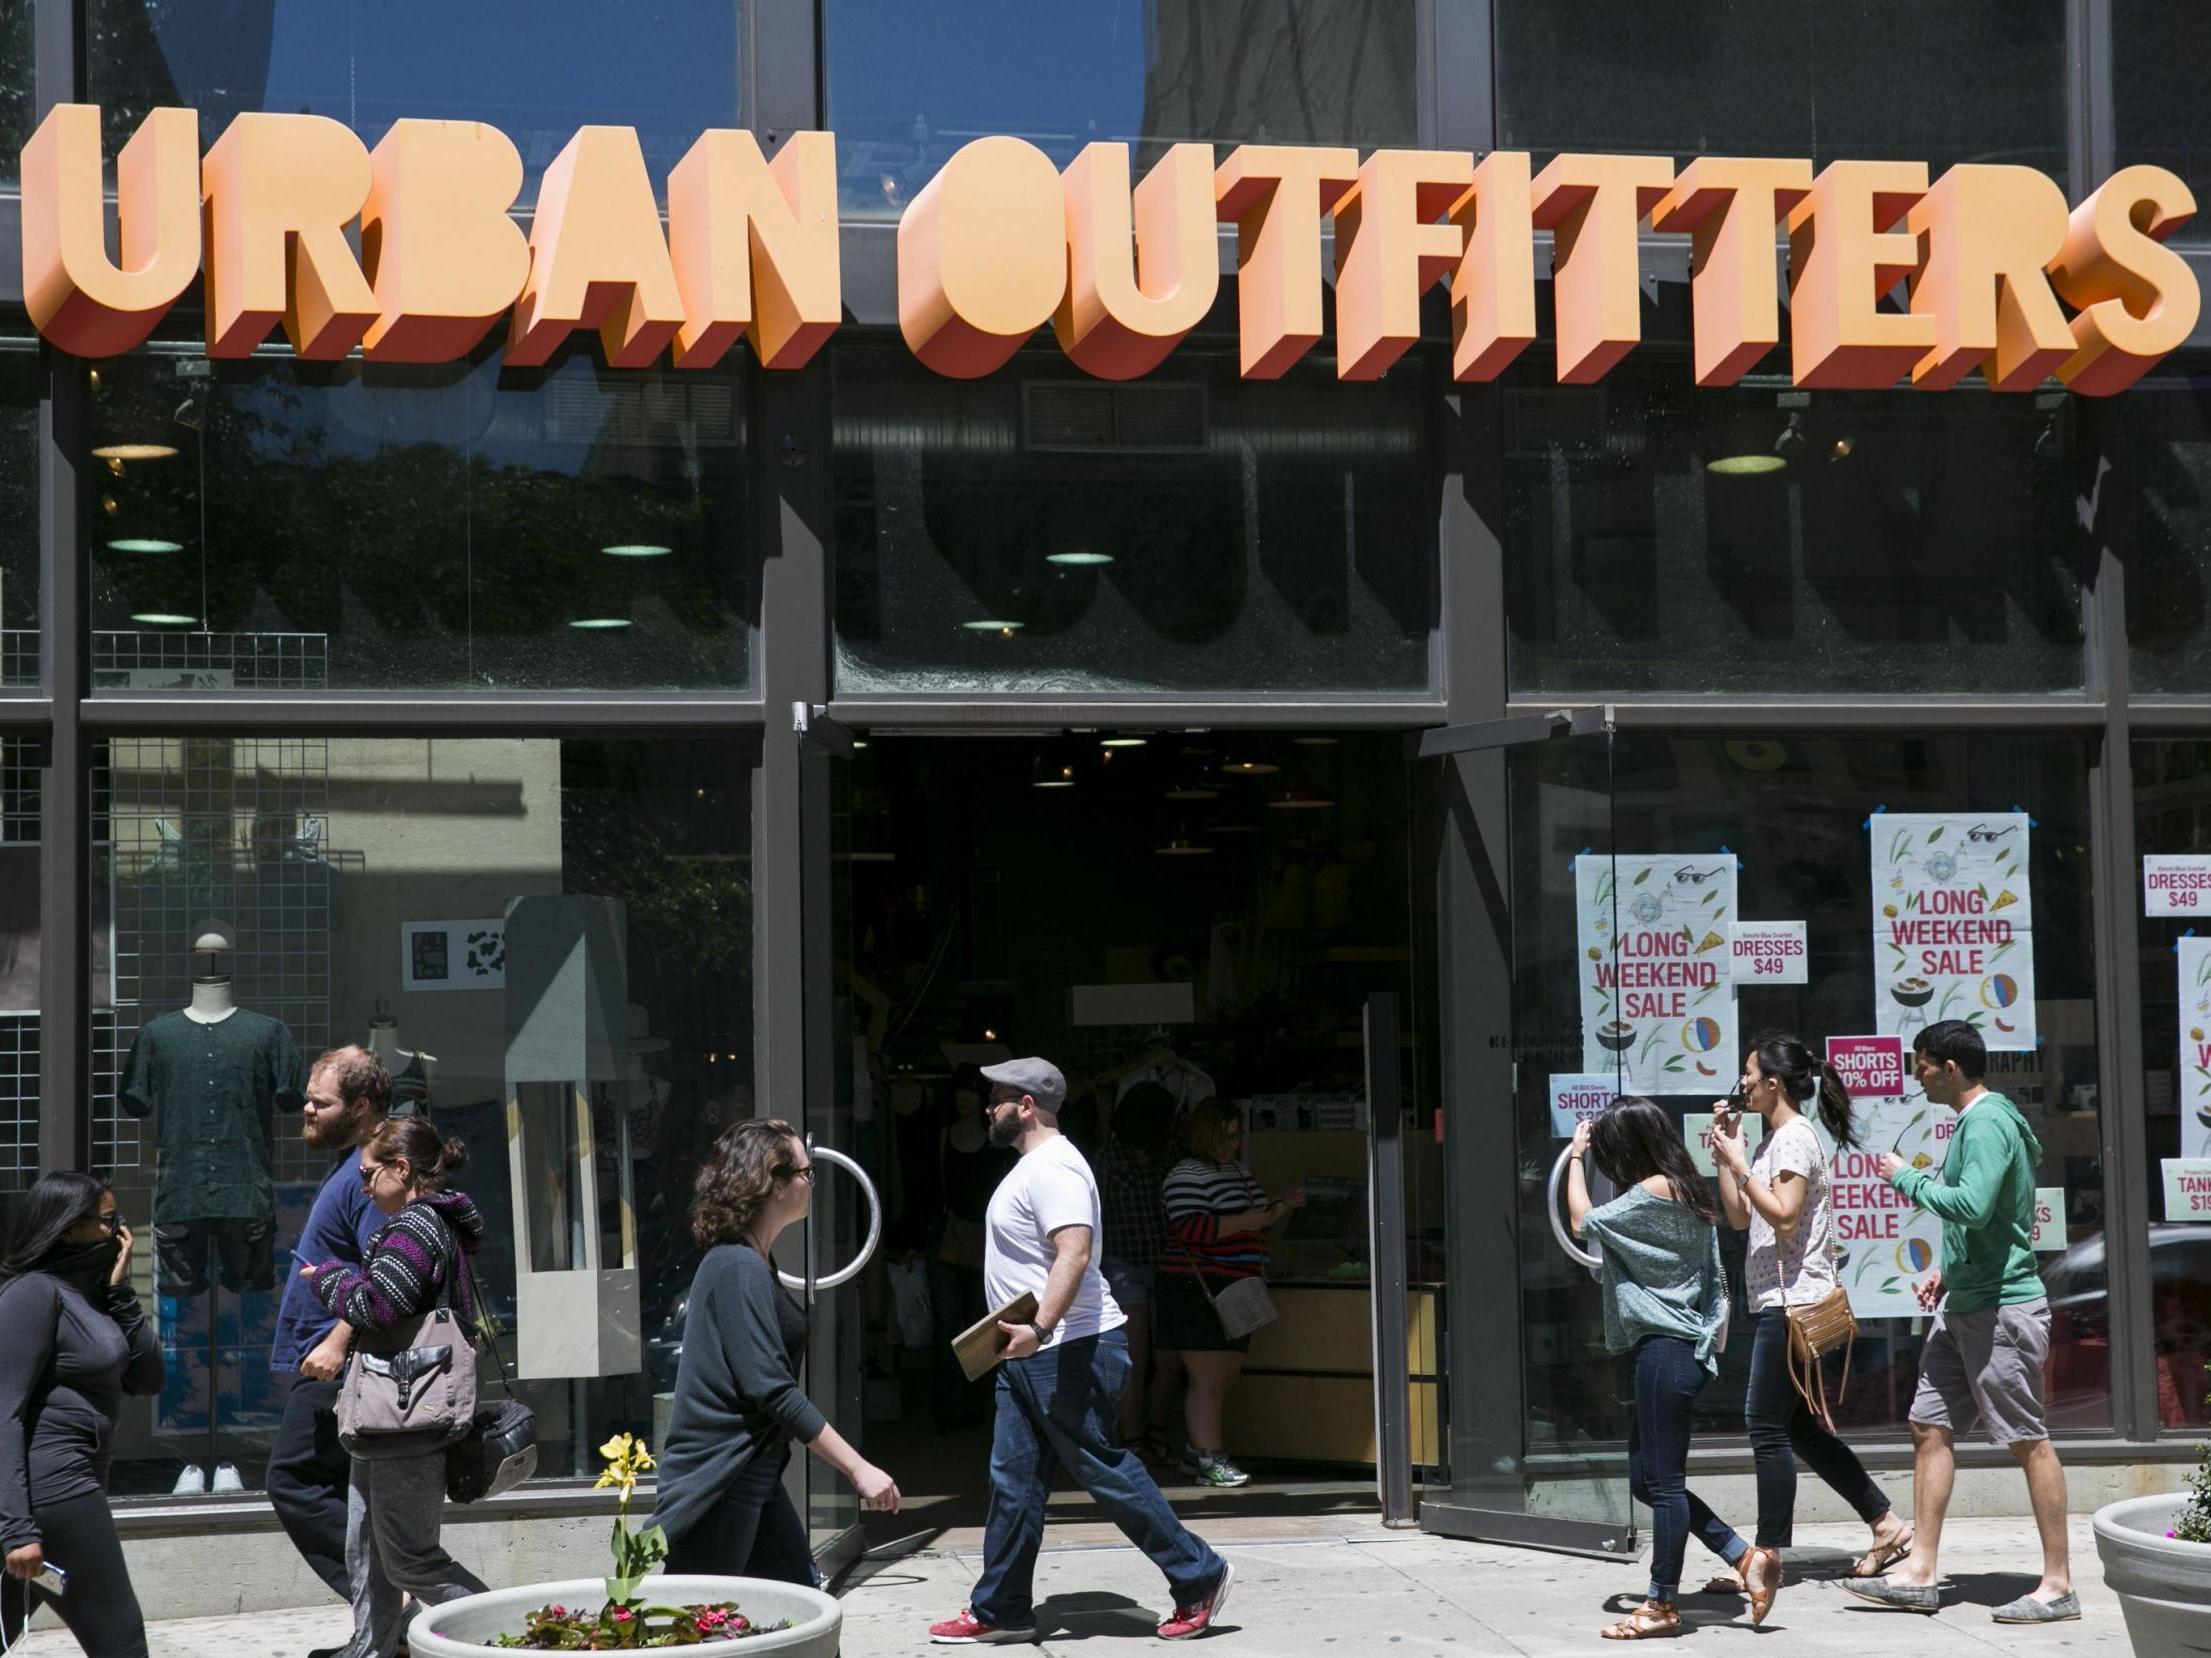 Urban Outfittera